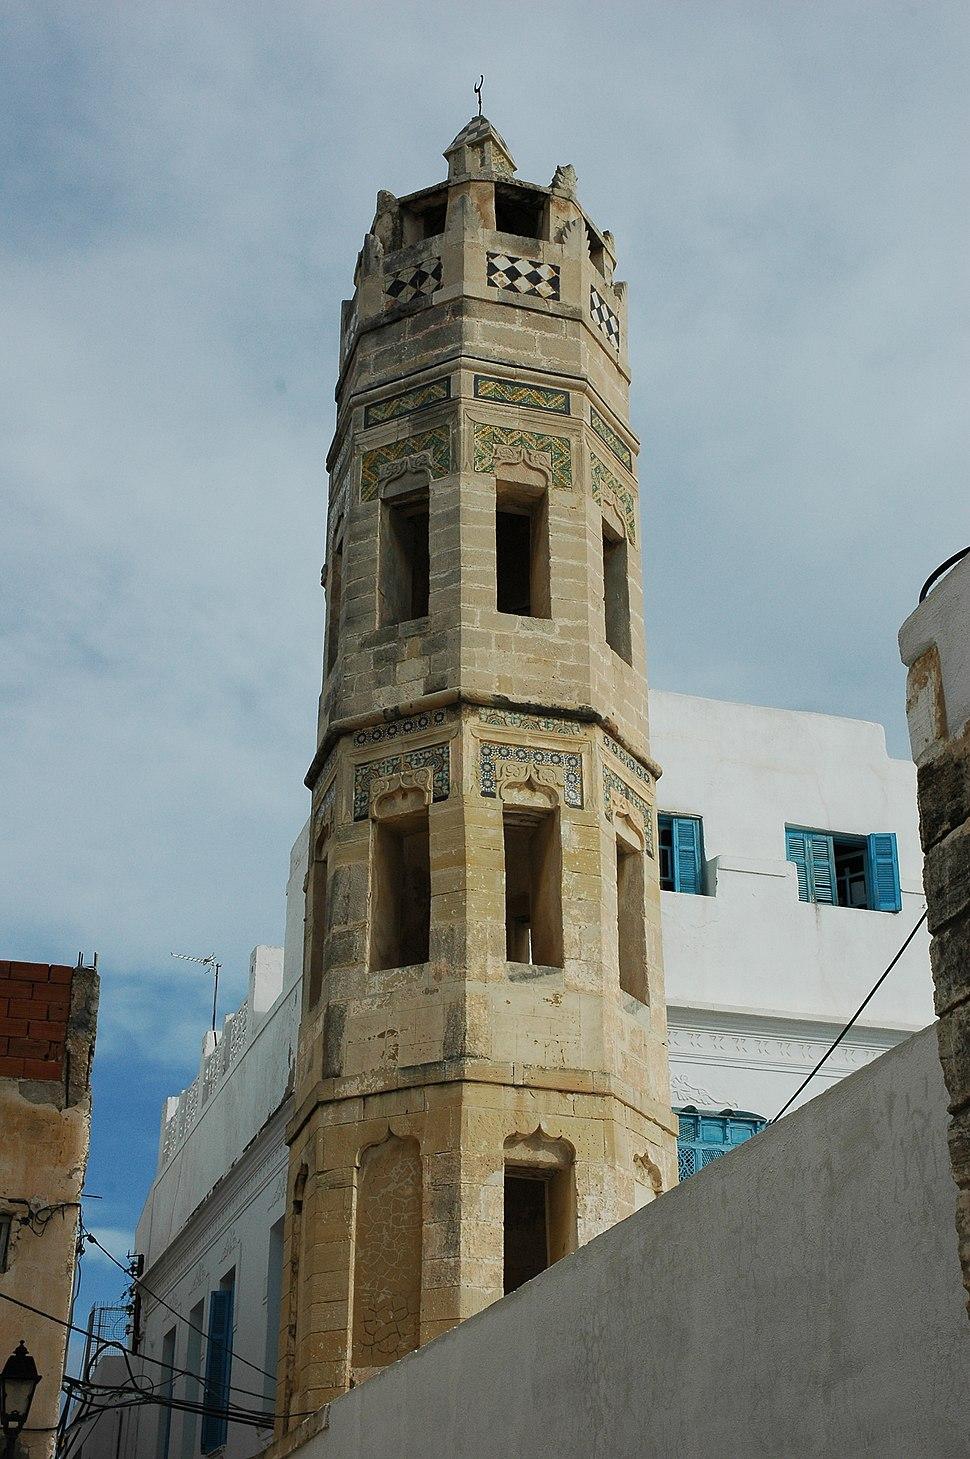 TUNISIE SOUSSE 04